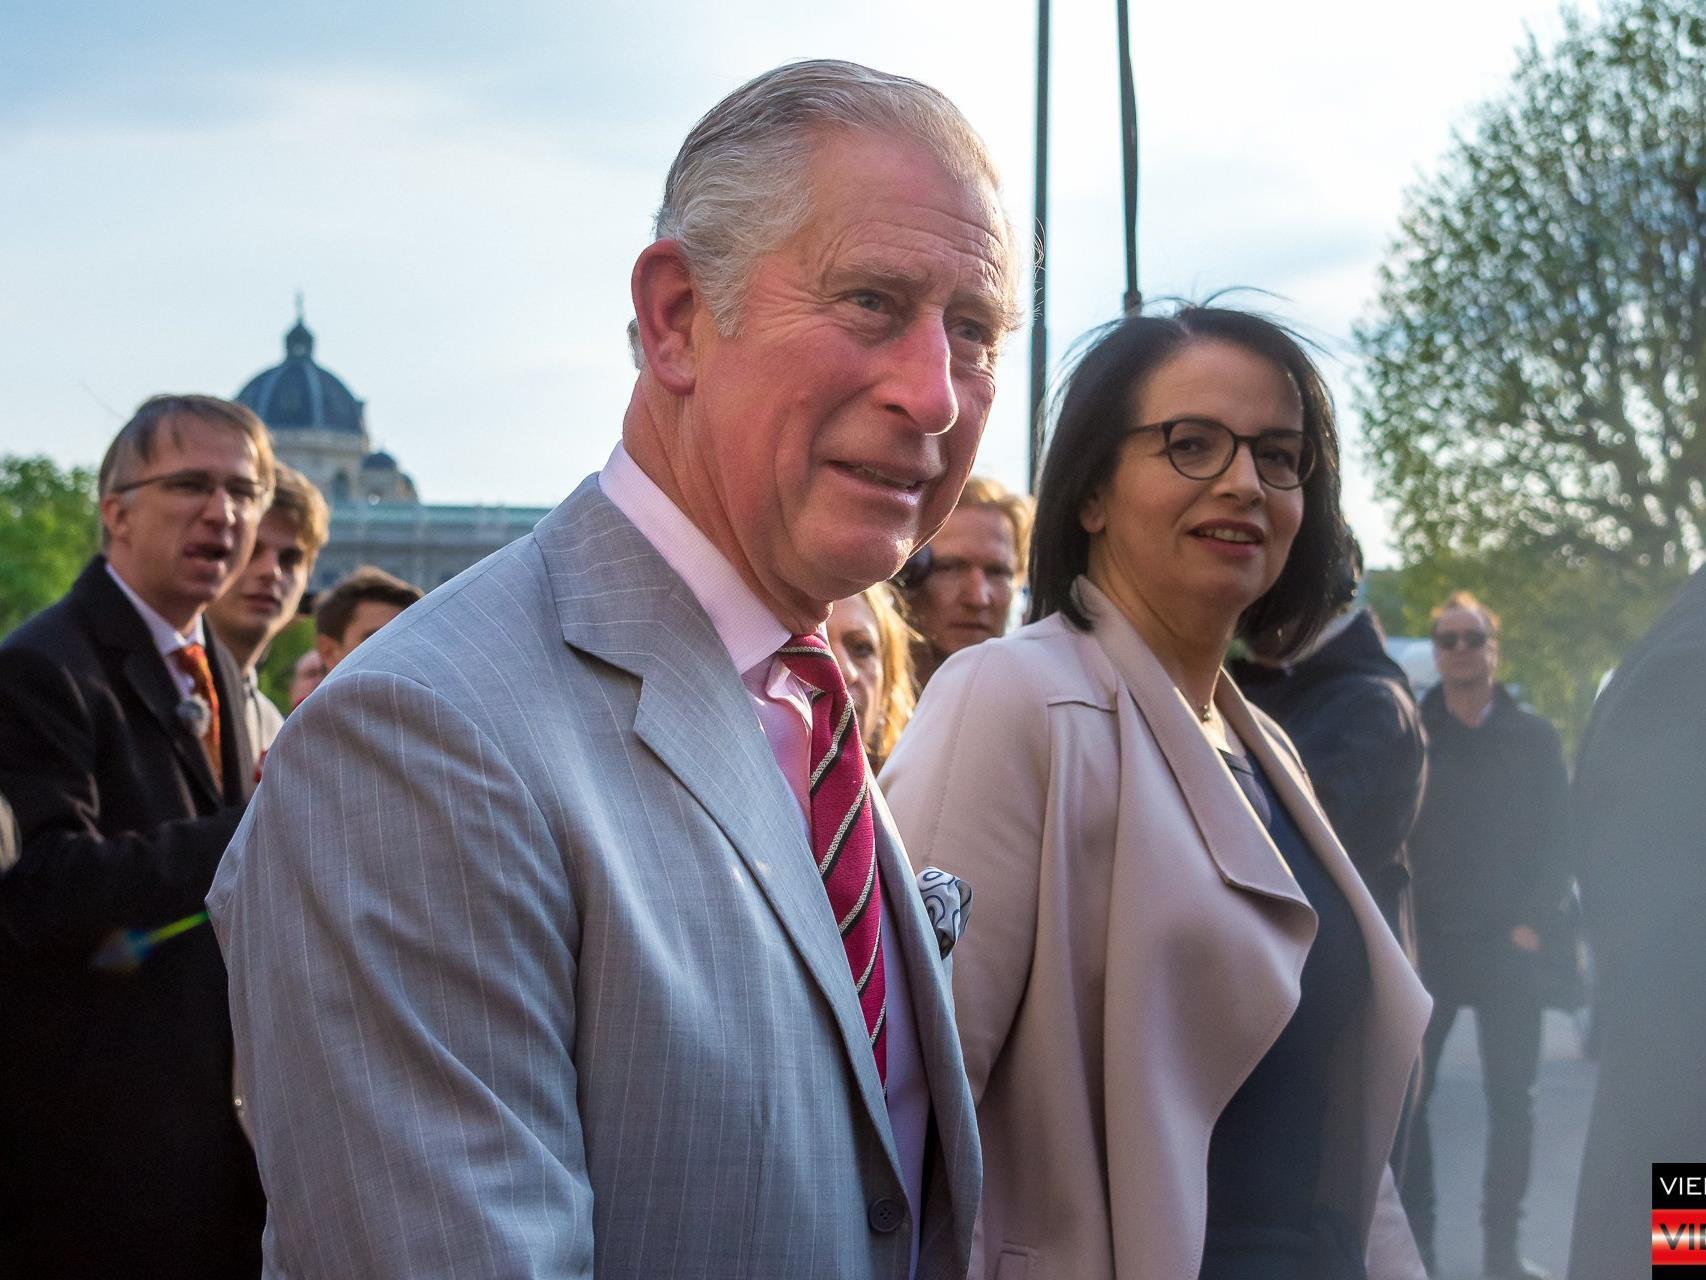 Thronfolger Prinz Charles und Ehefrau Camilla - 05.04.2017